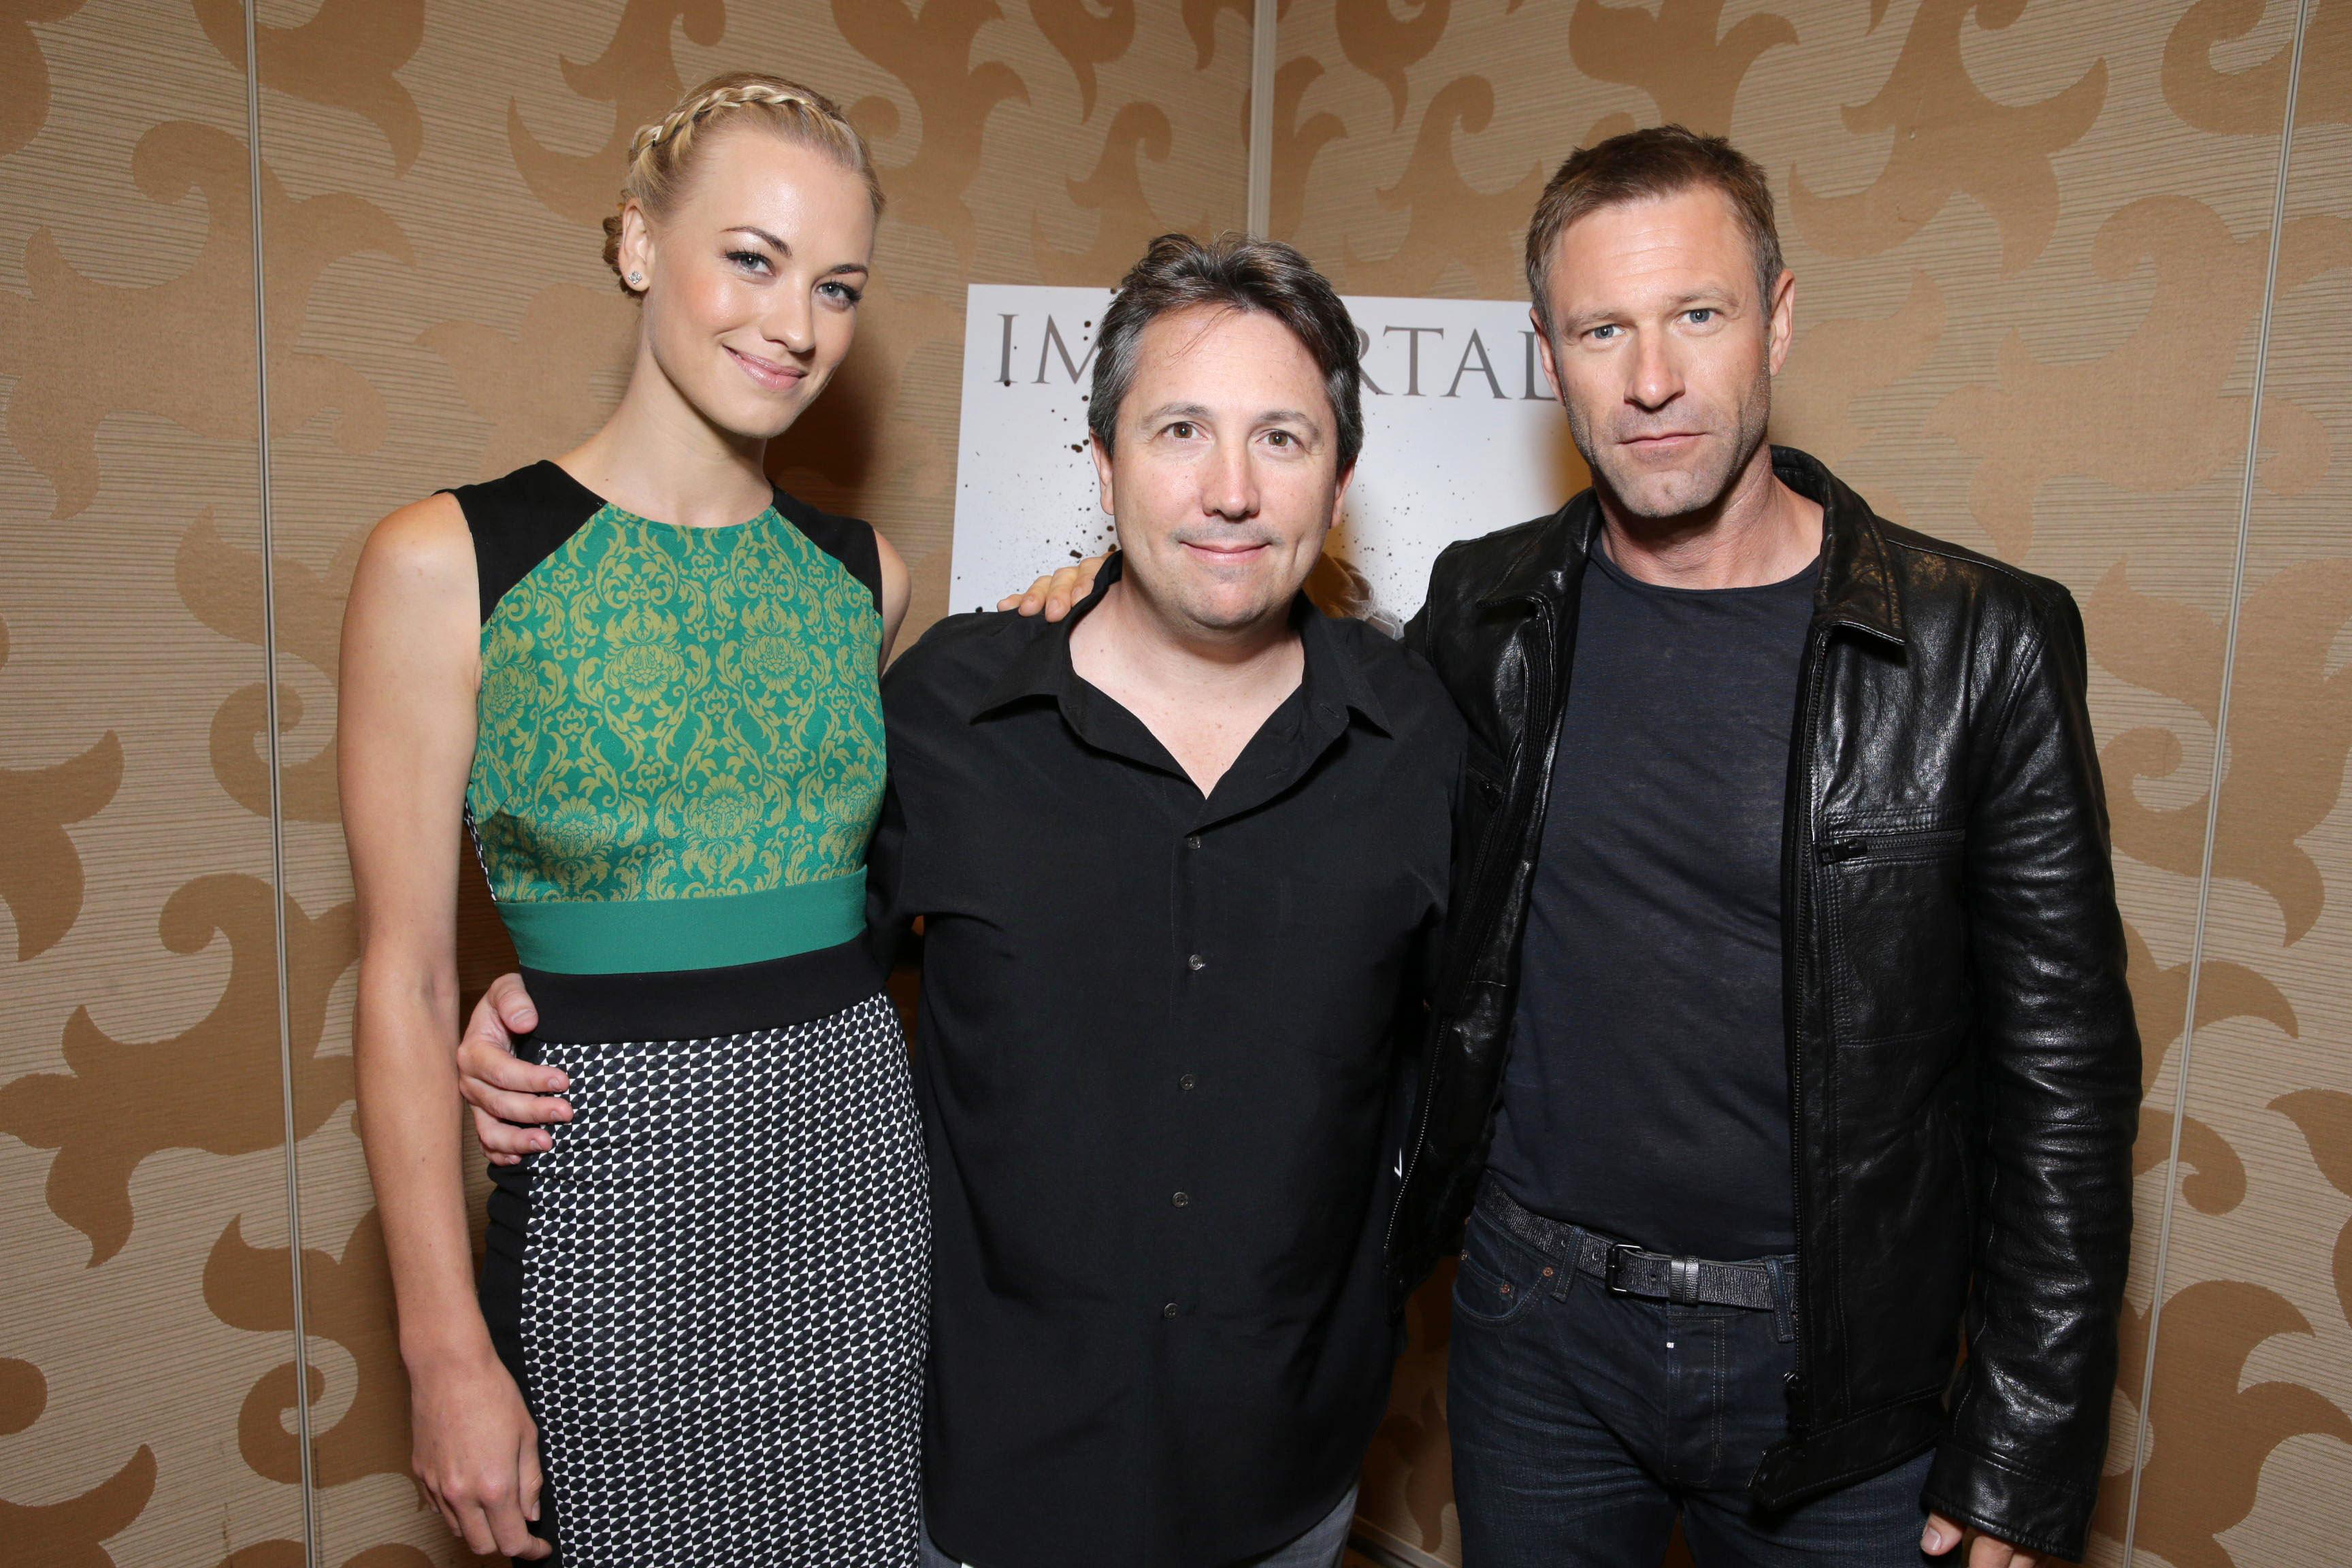 Yvonne Strahovski, Stuart Beattie and Aaron Eckhart at Lionsgate I, Frankenstein Presentation at San Diego Comic-Con 20136